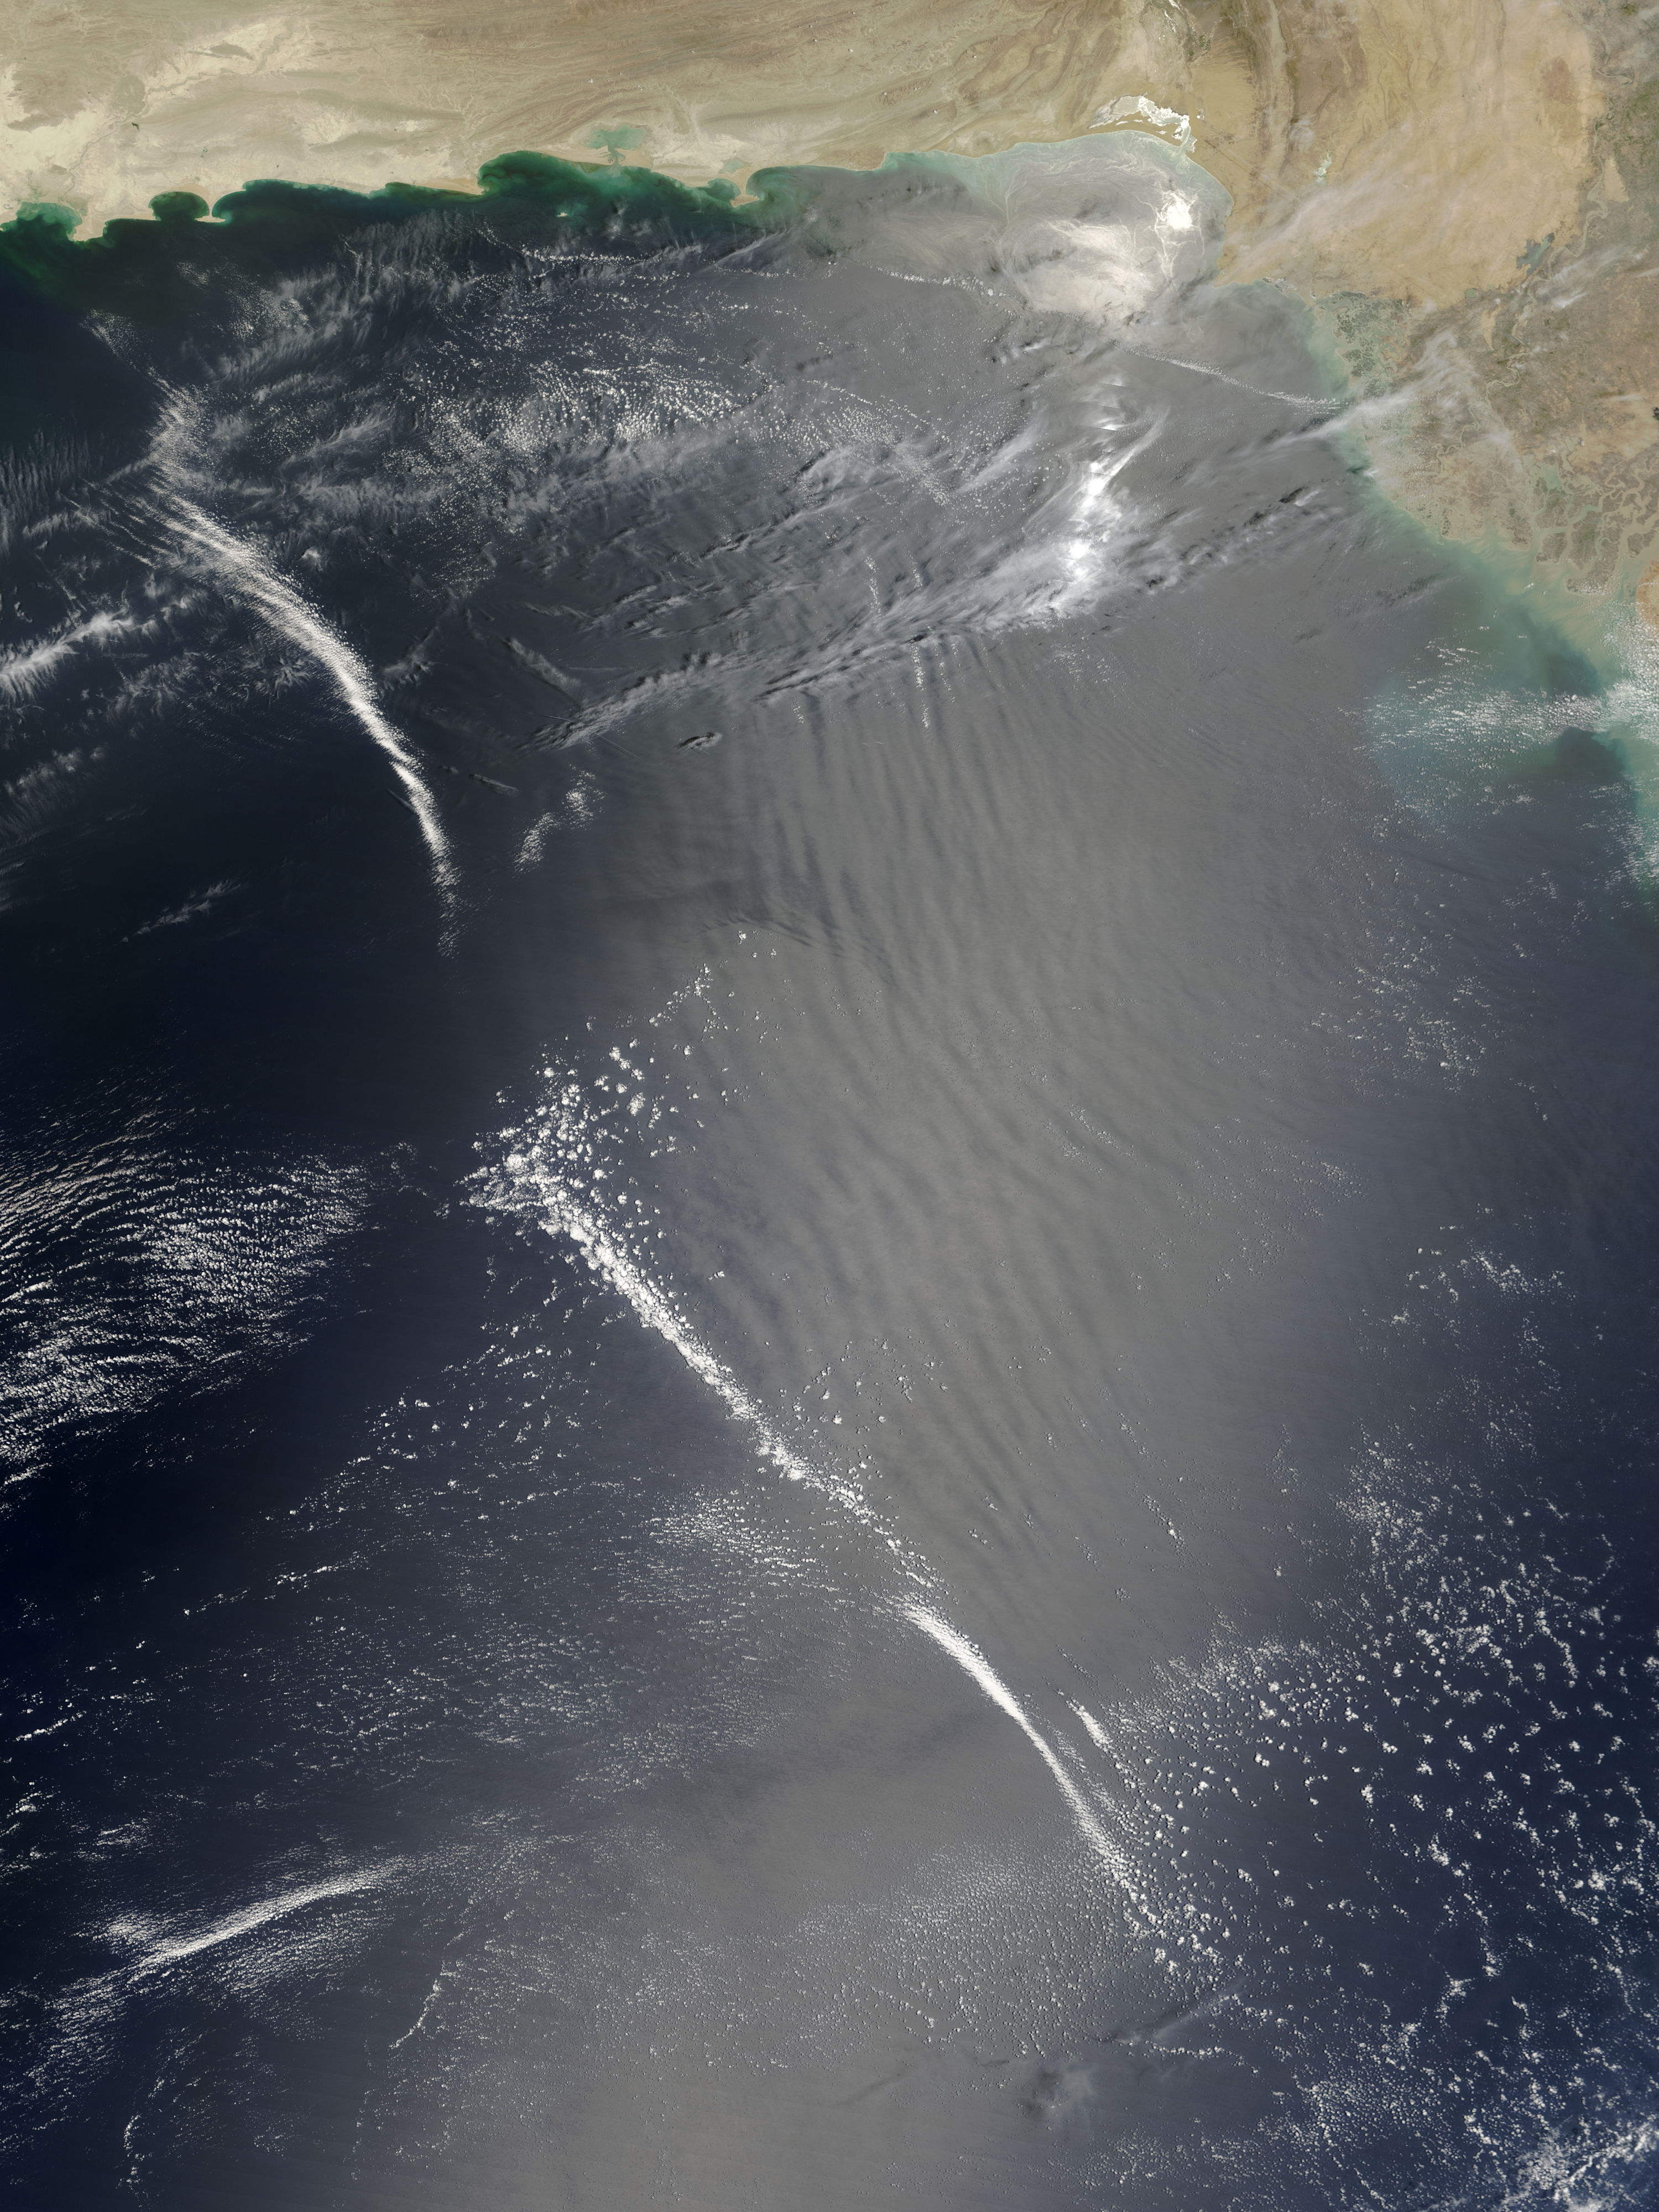 ArabianSea.A2005143.0625.250m Satellite Maps Download on horizon download, wifi download, digital download, film download, solar system download,